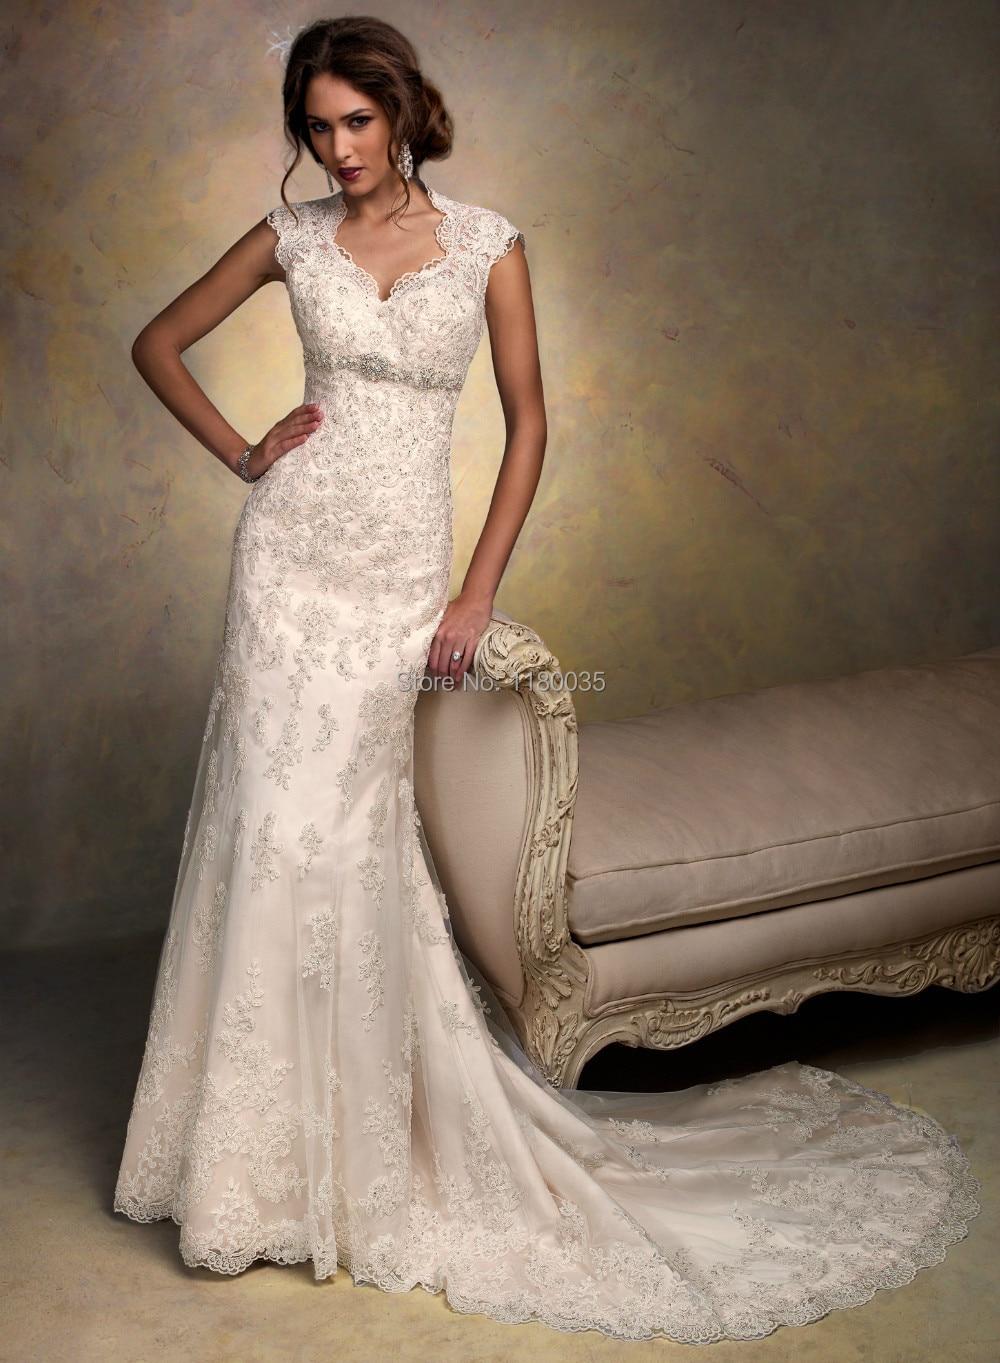 Western Lace Cap Sleeve Wedding Dress 2014 Classic Style Beaded ...